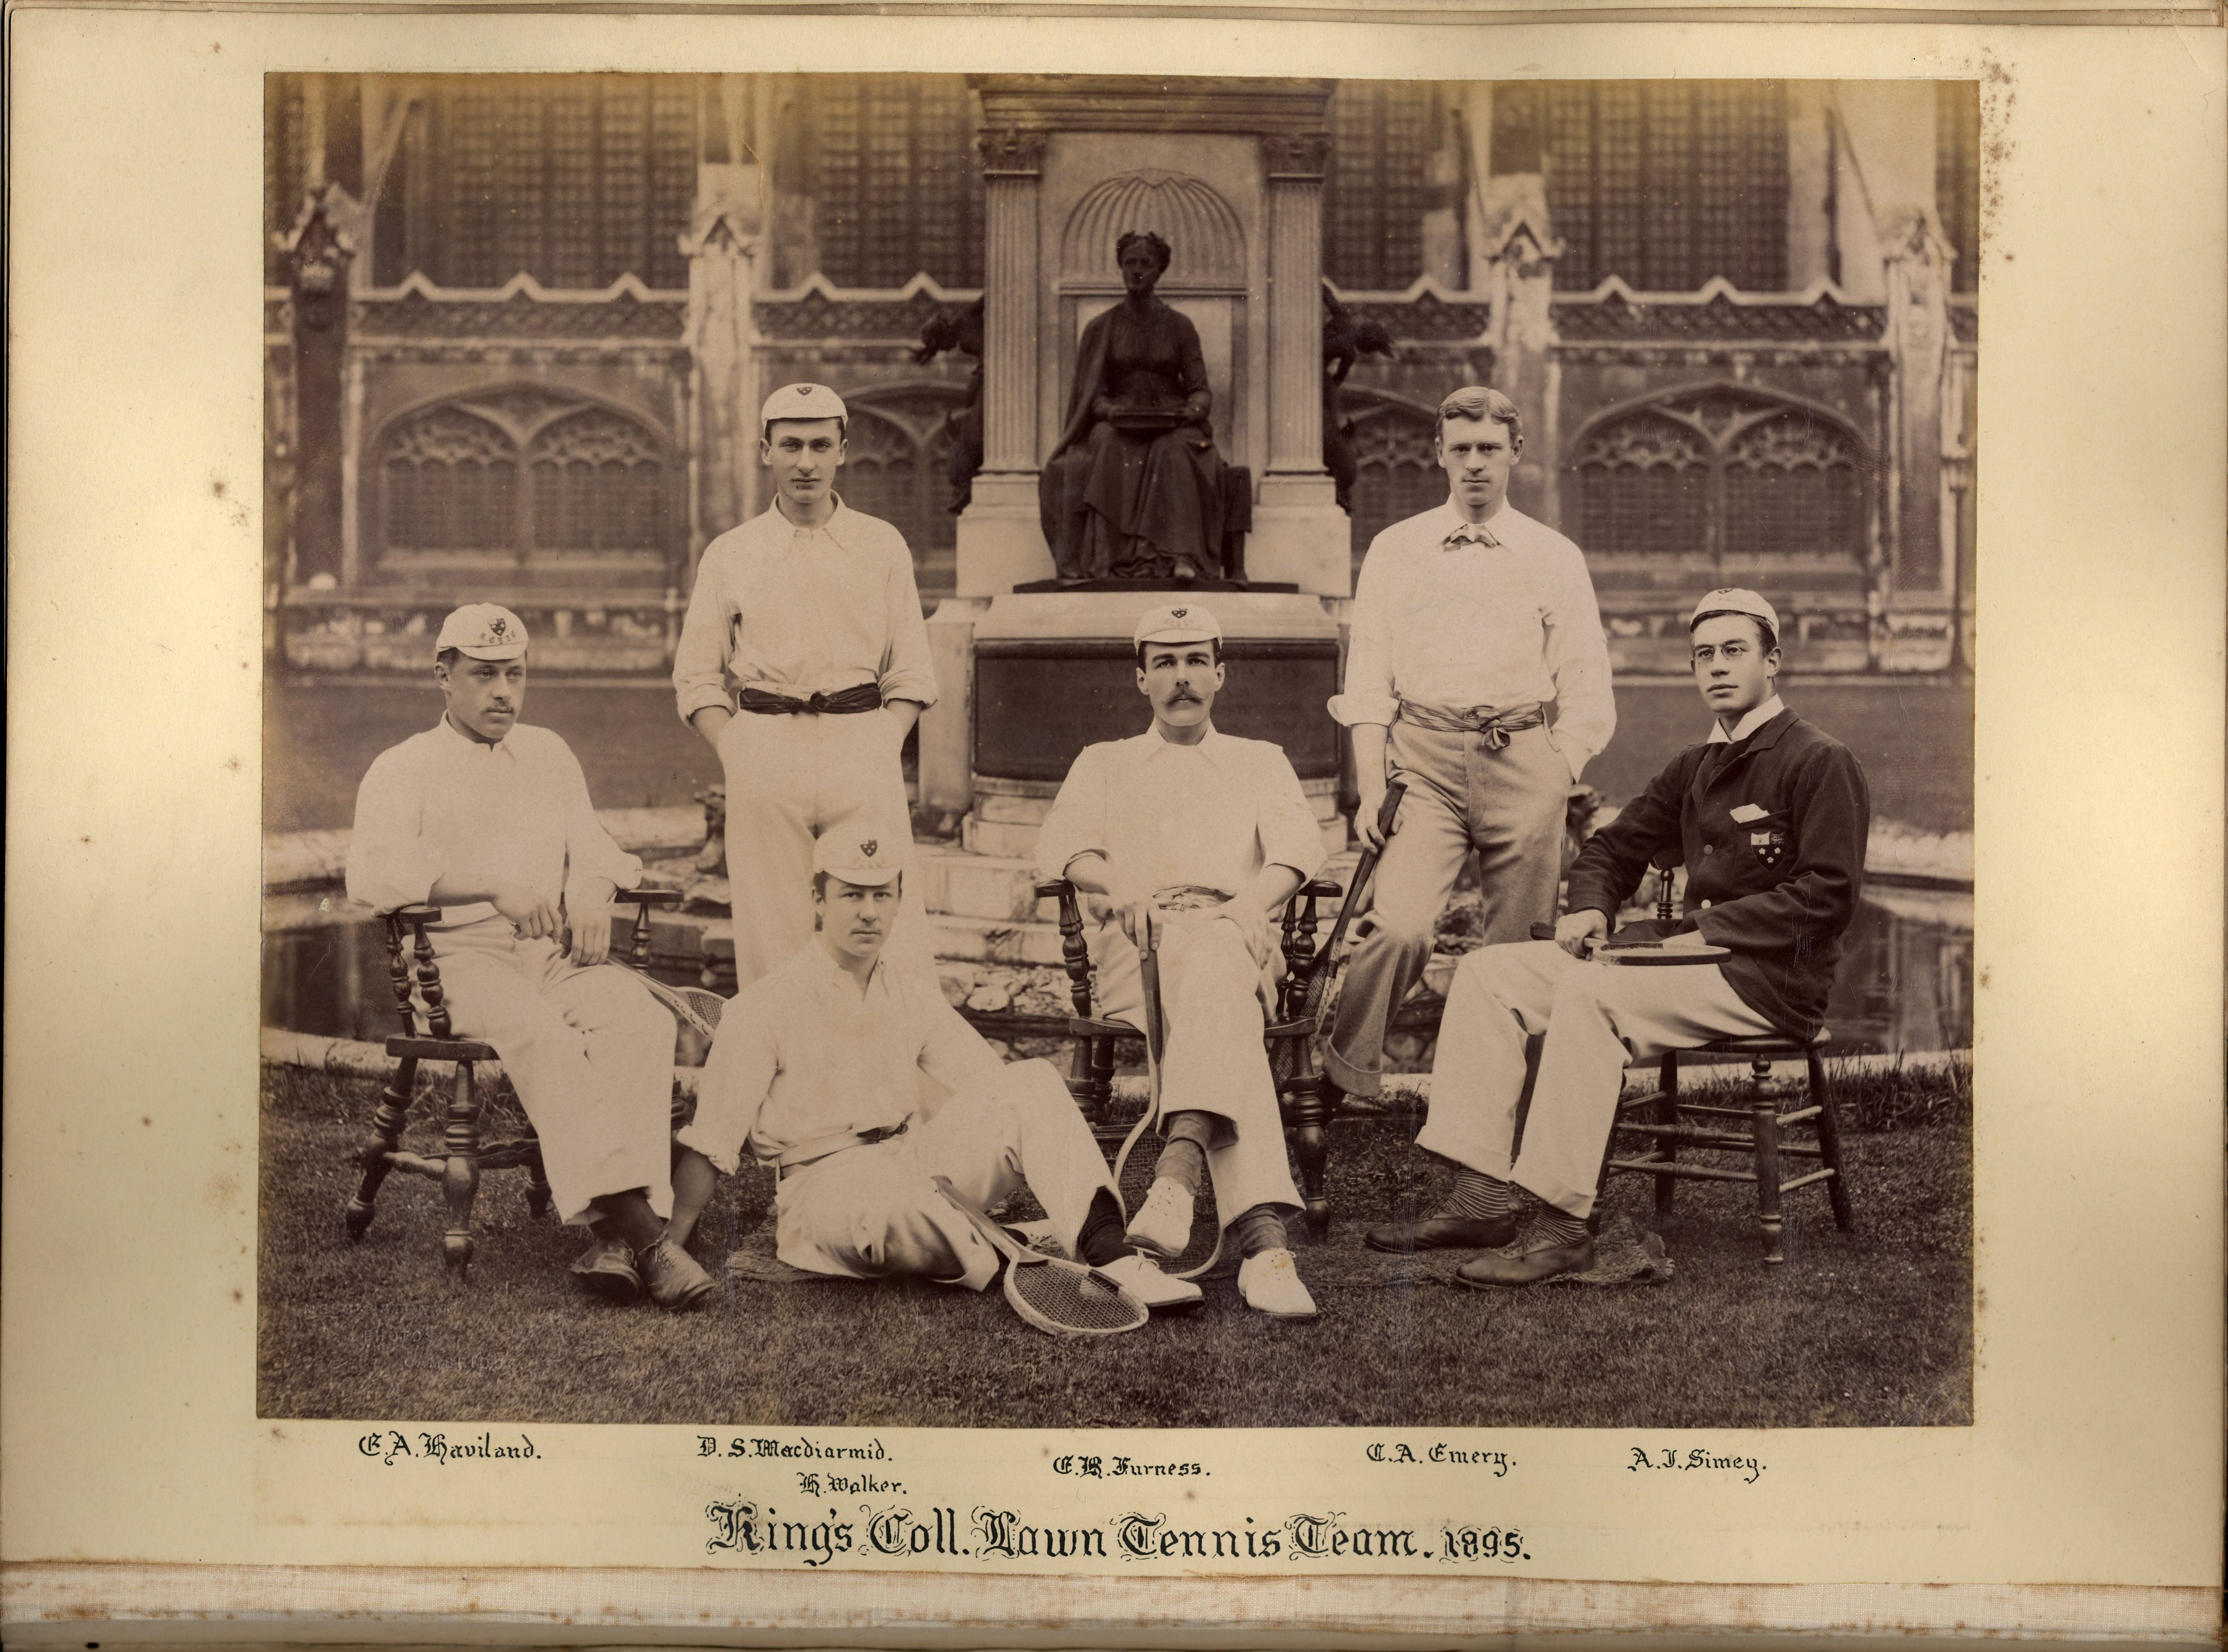 King's College Lawn Tennis team, 1895 [KCAC/1/3/6/4/1]